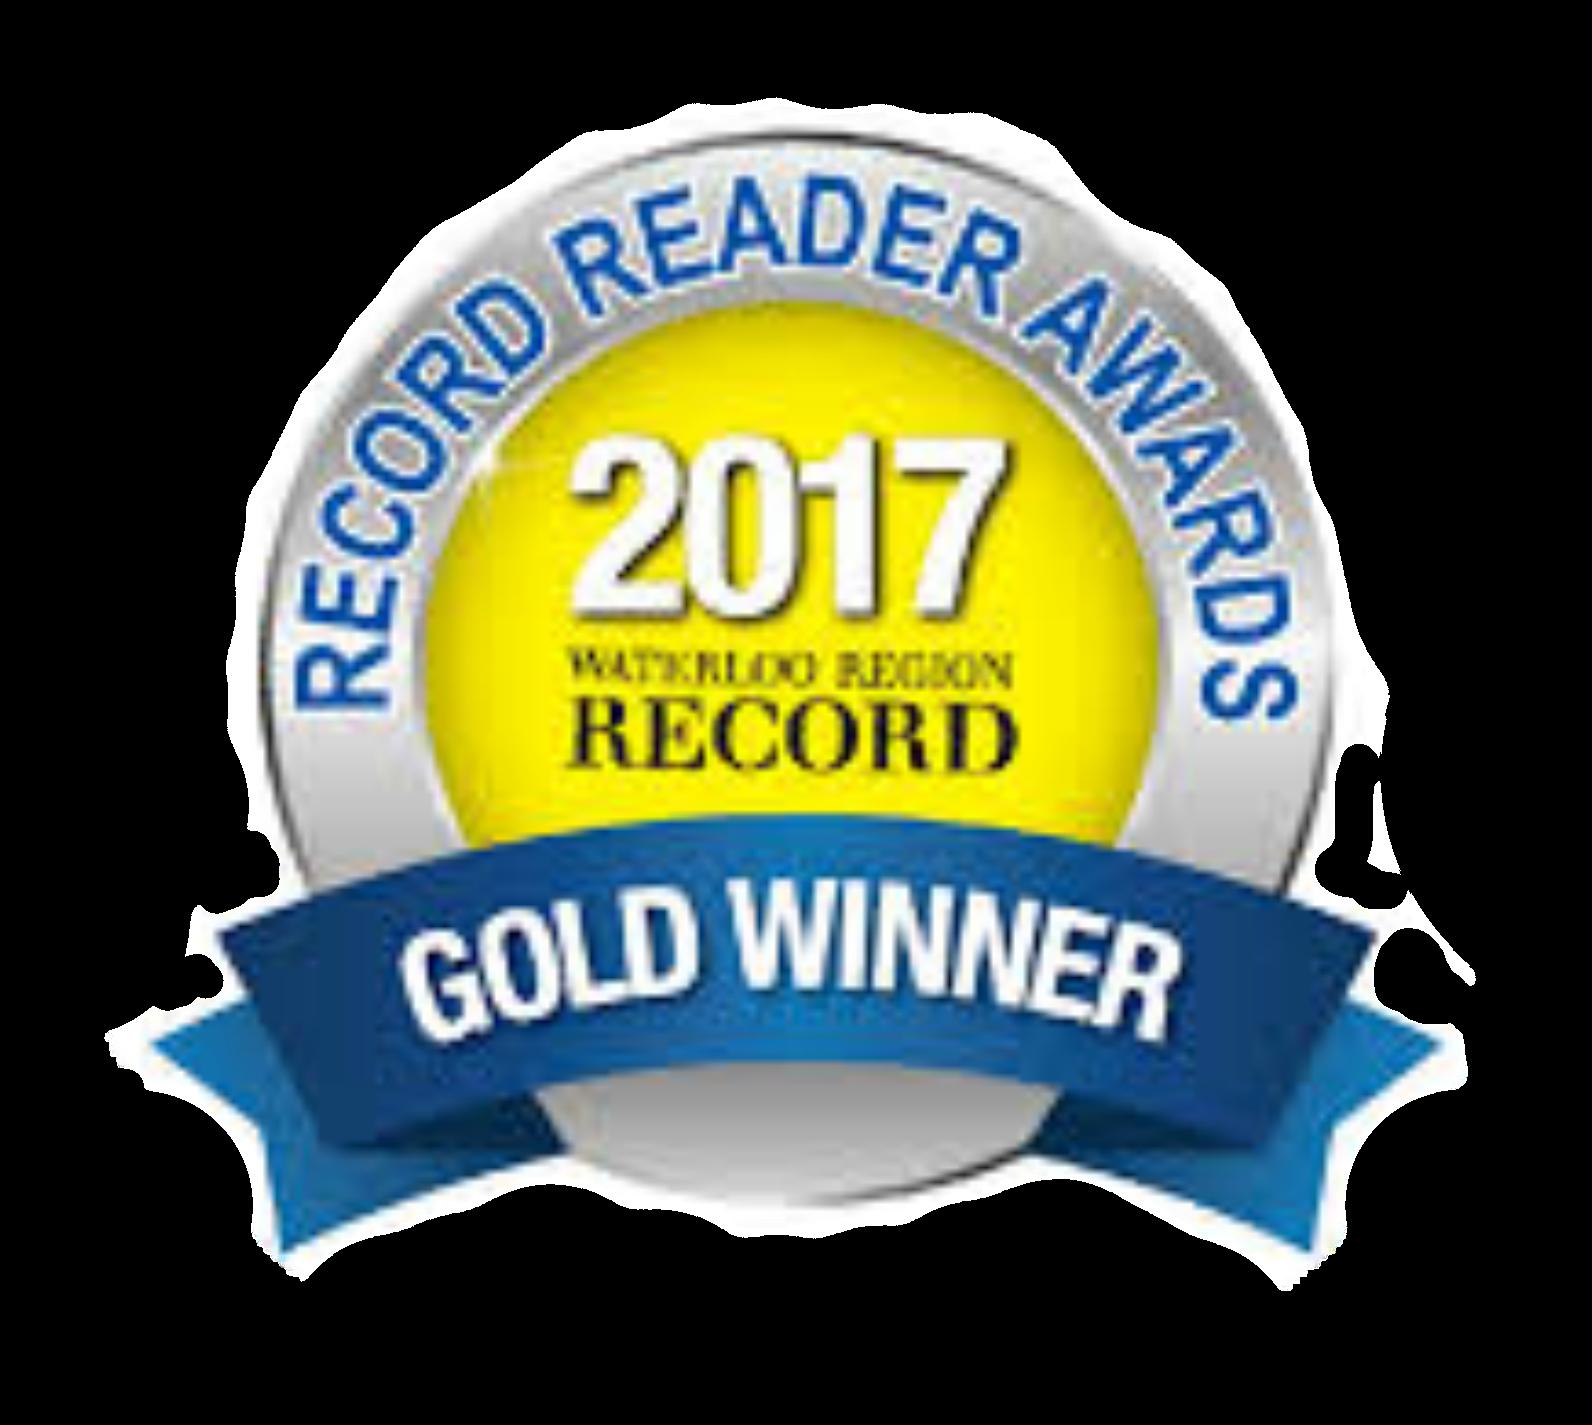 Shoreline Glow The Record Readers Award